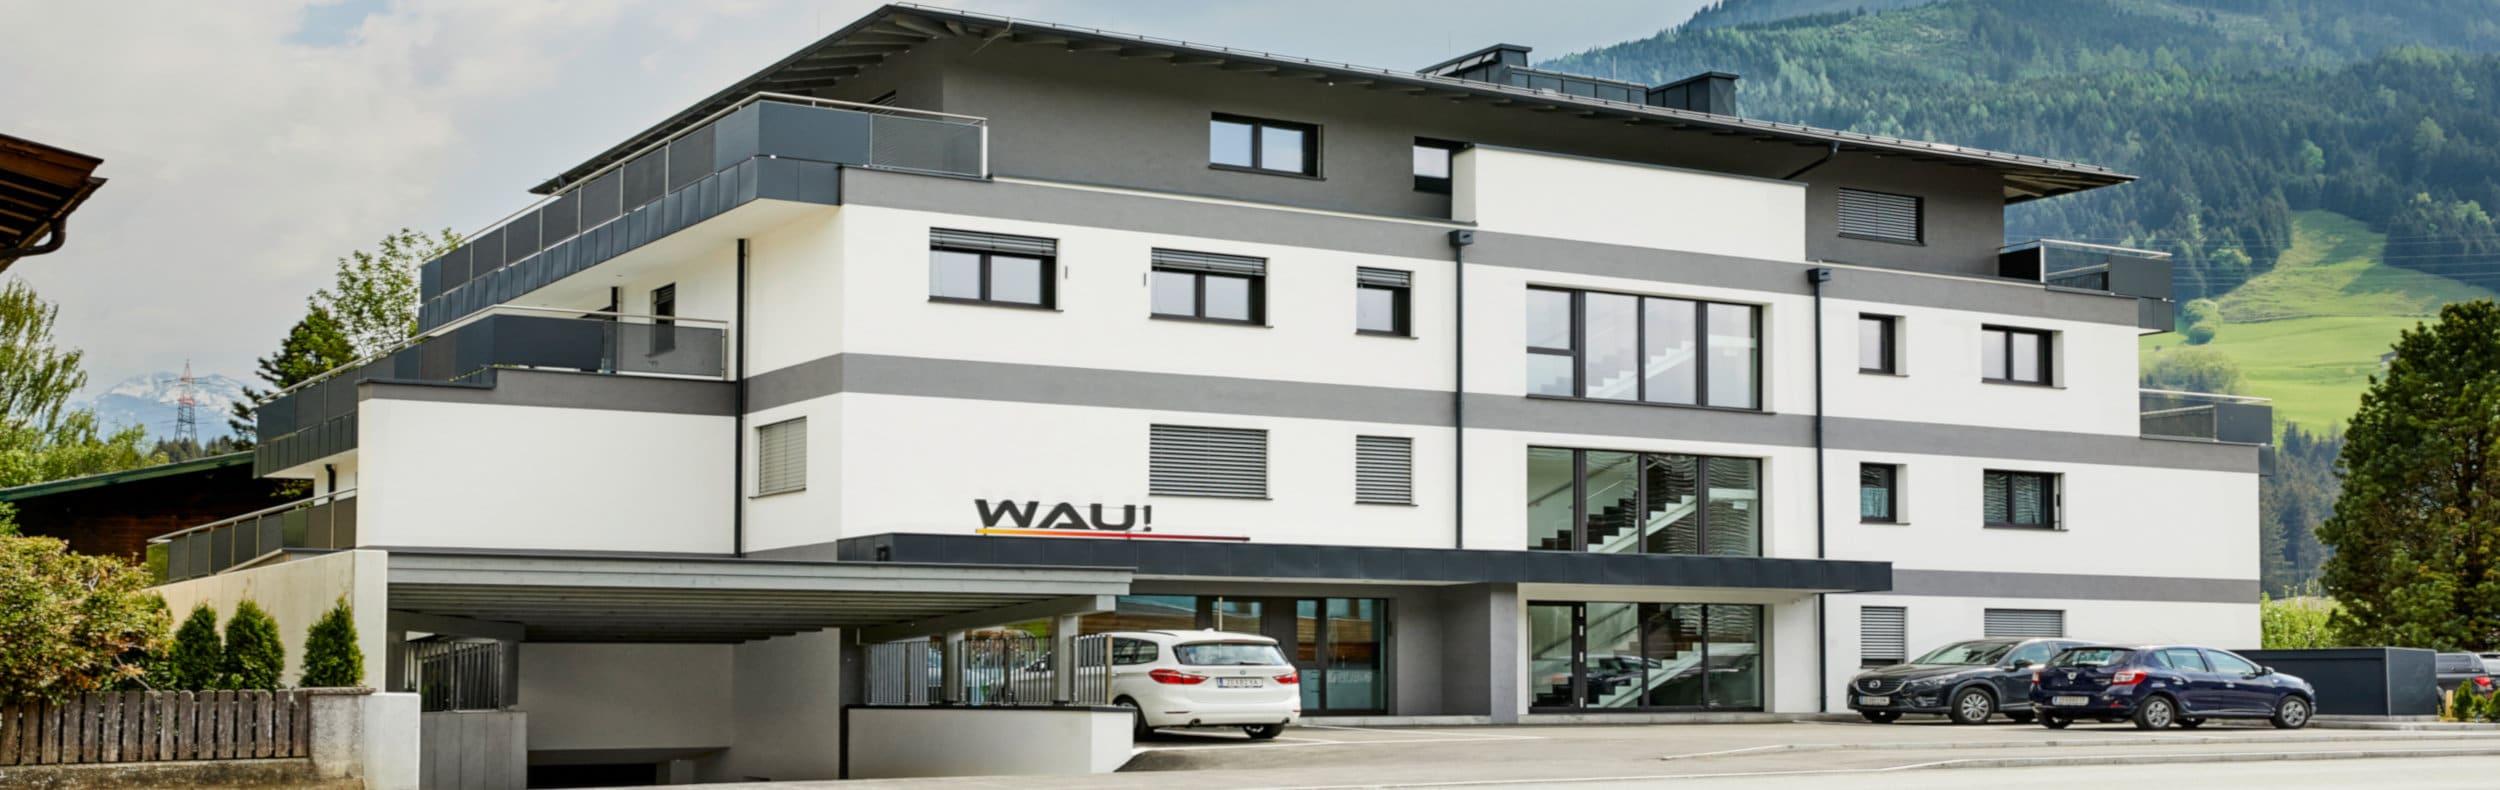 Wohlfühl-Lounge-Mühlbach-Bramberg-Wau-Wohnbau